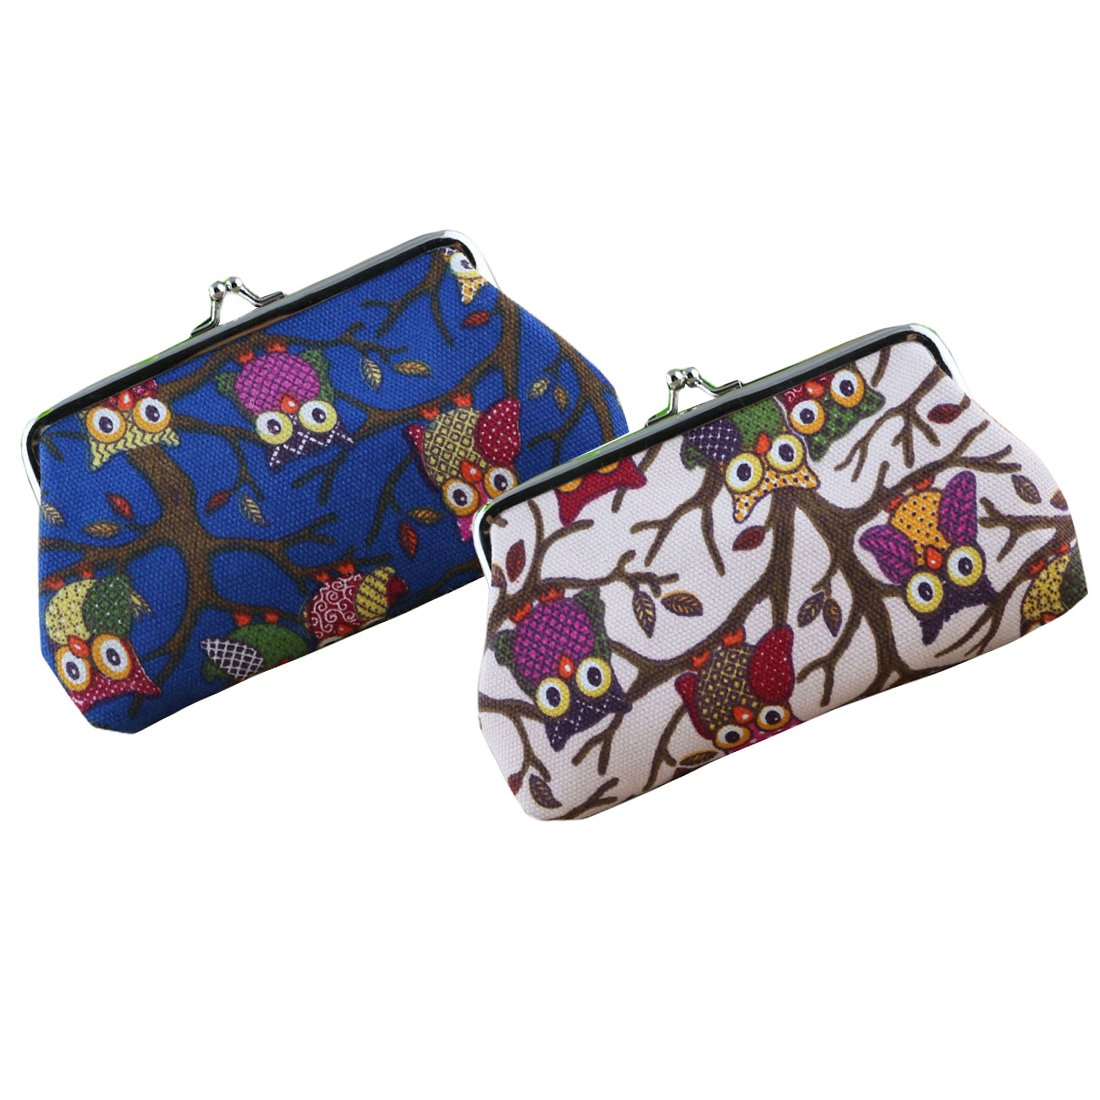 Oyachic 2 Packs Coin Pouch Phone Purse Owl Pattern Clasp Closure Wallet Gift 7.1L X 3.7 H Coin Purse